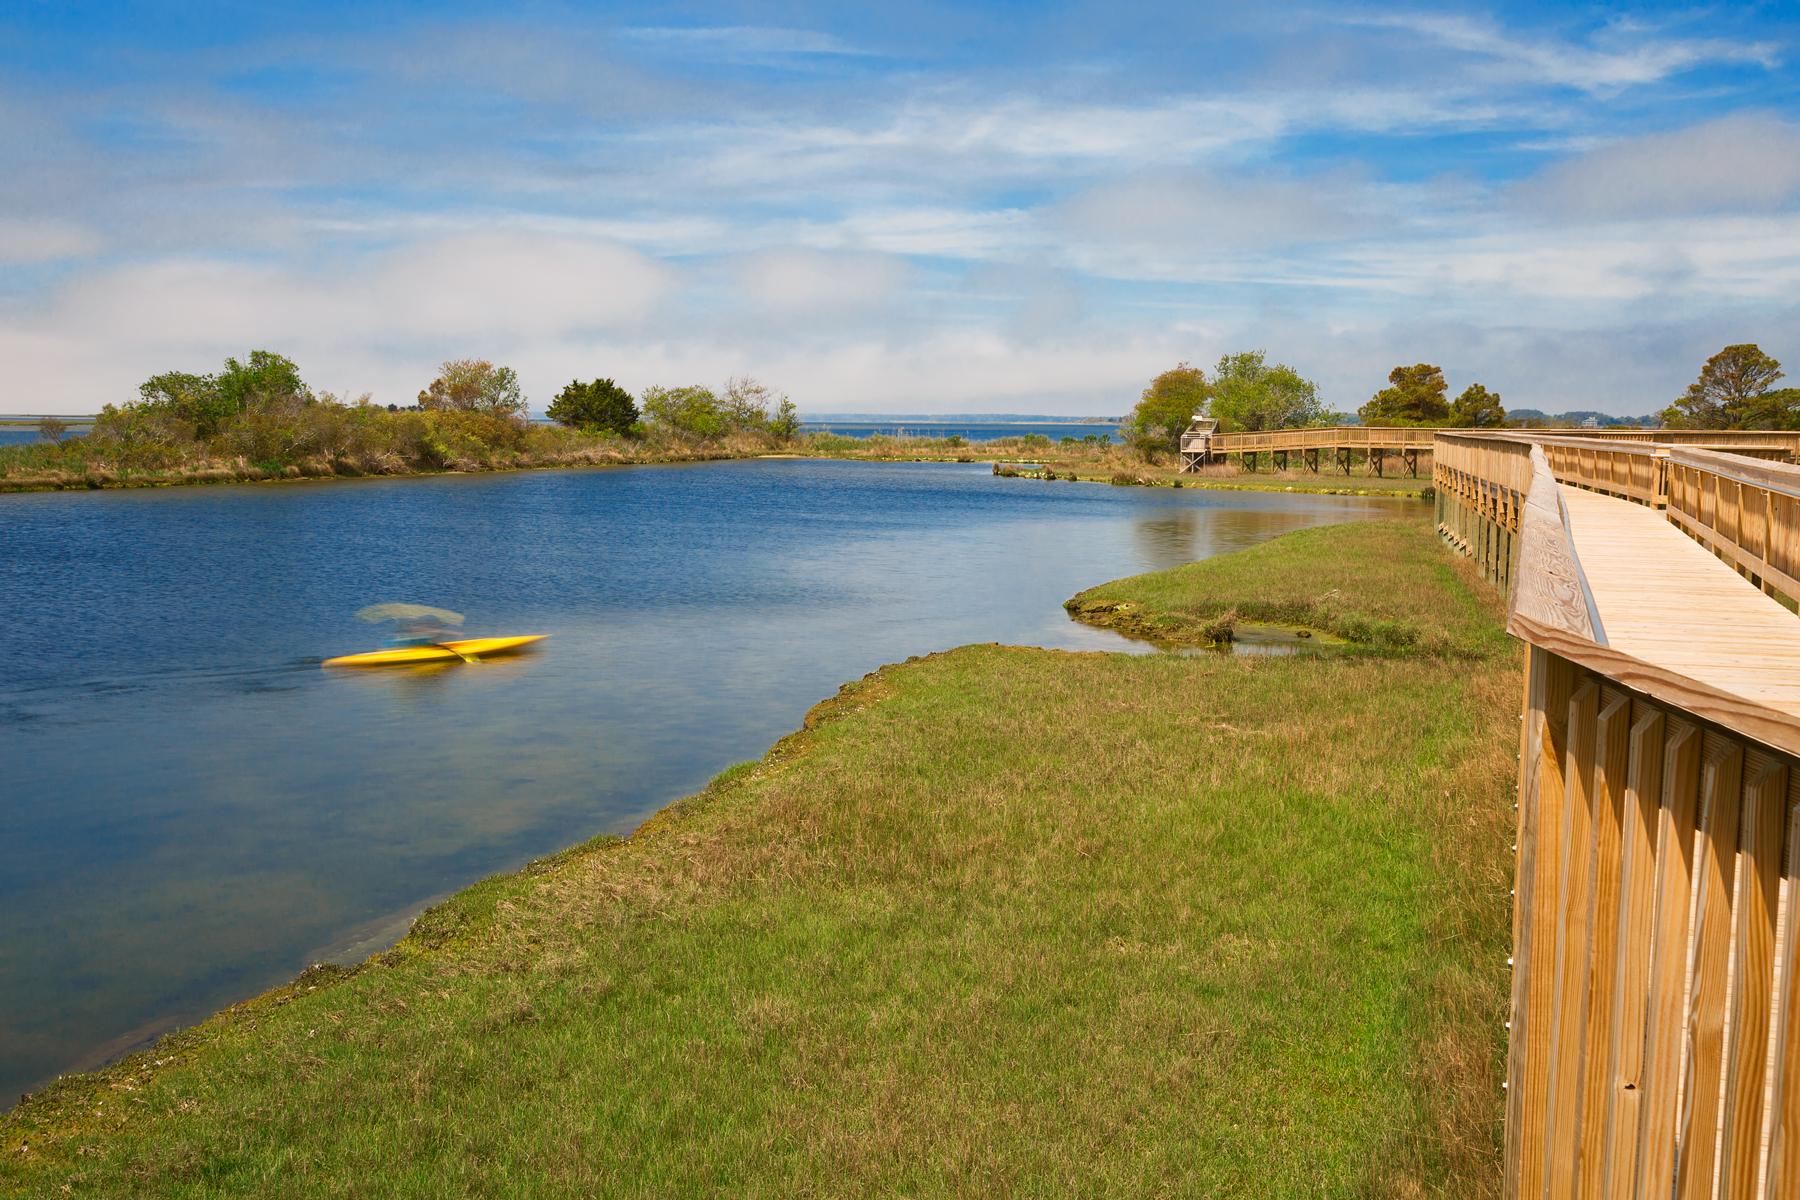 Assateague Island Marsh, America, Recreational, Shade, Serenity, HQ Photo